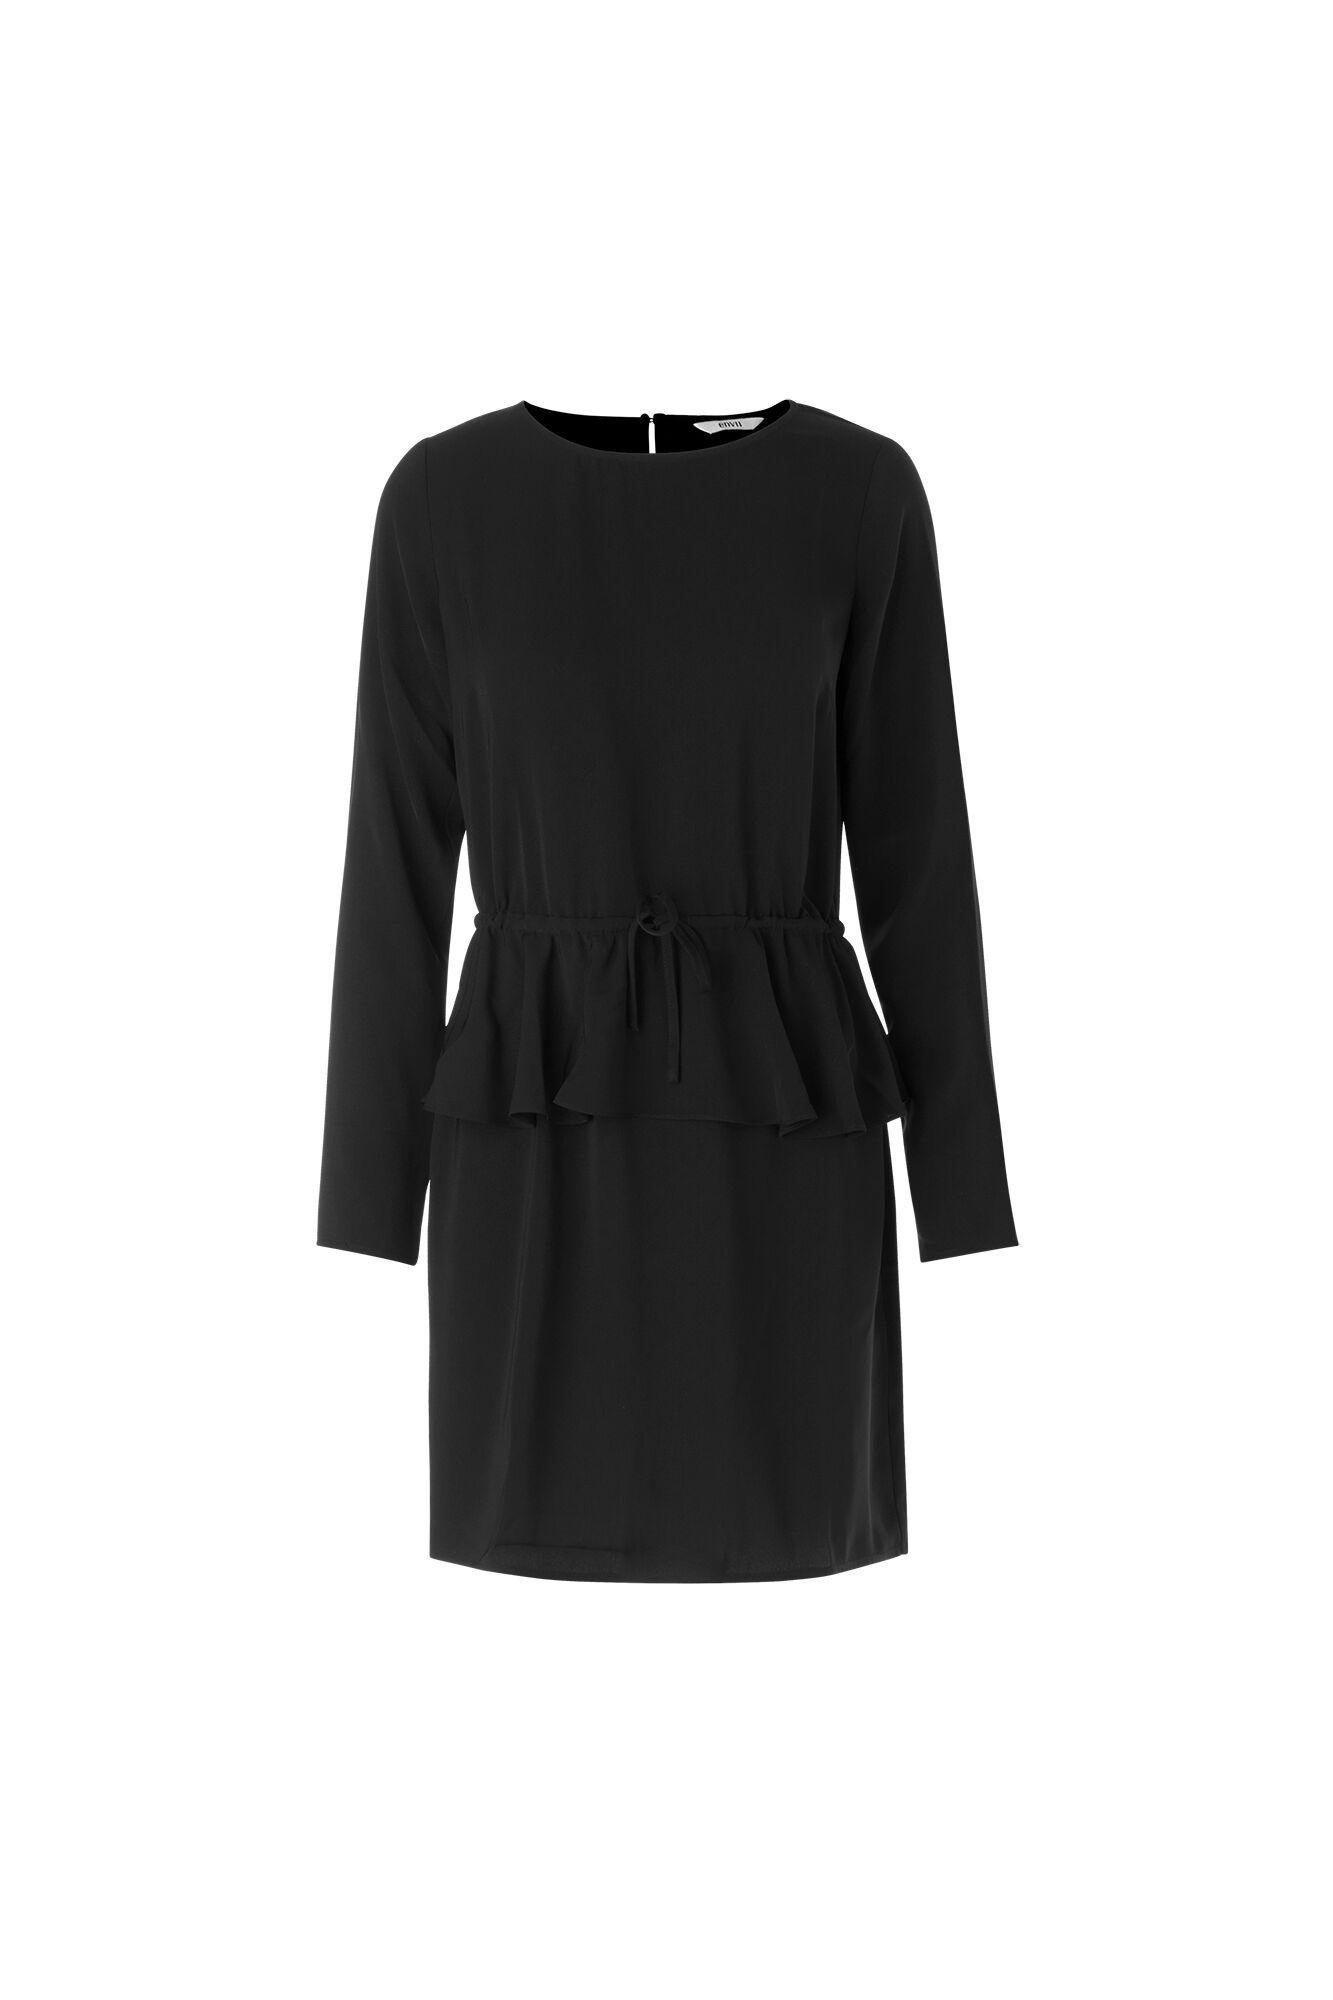 ENALPS LS DRESS 6392, BLACK